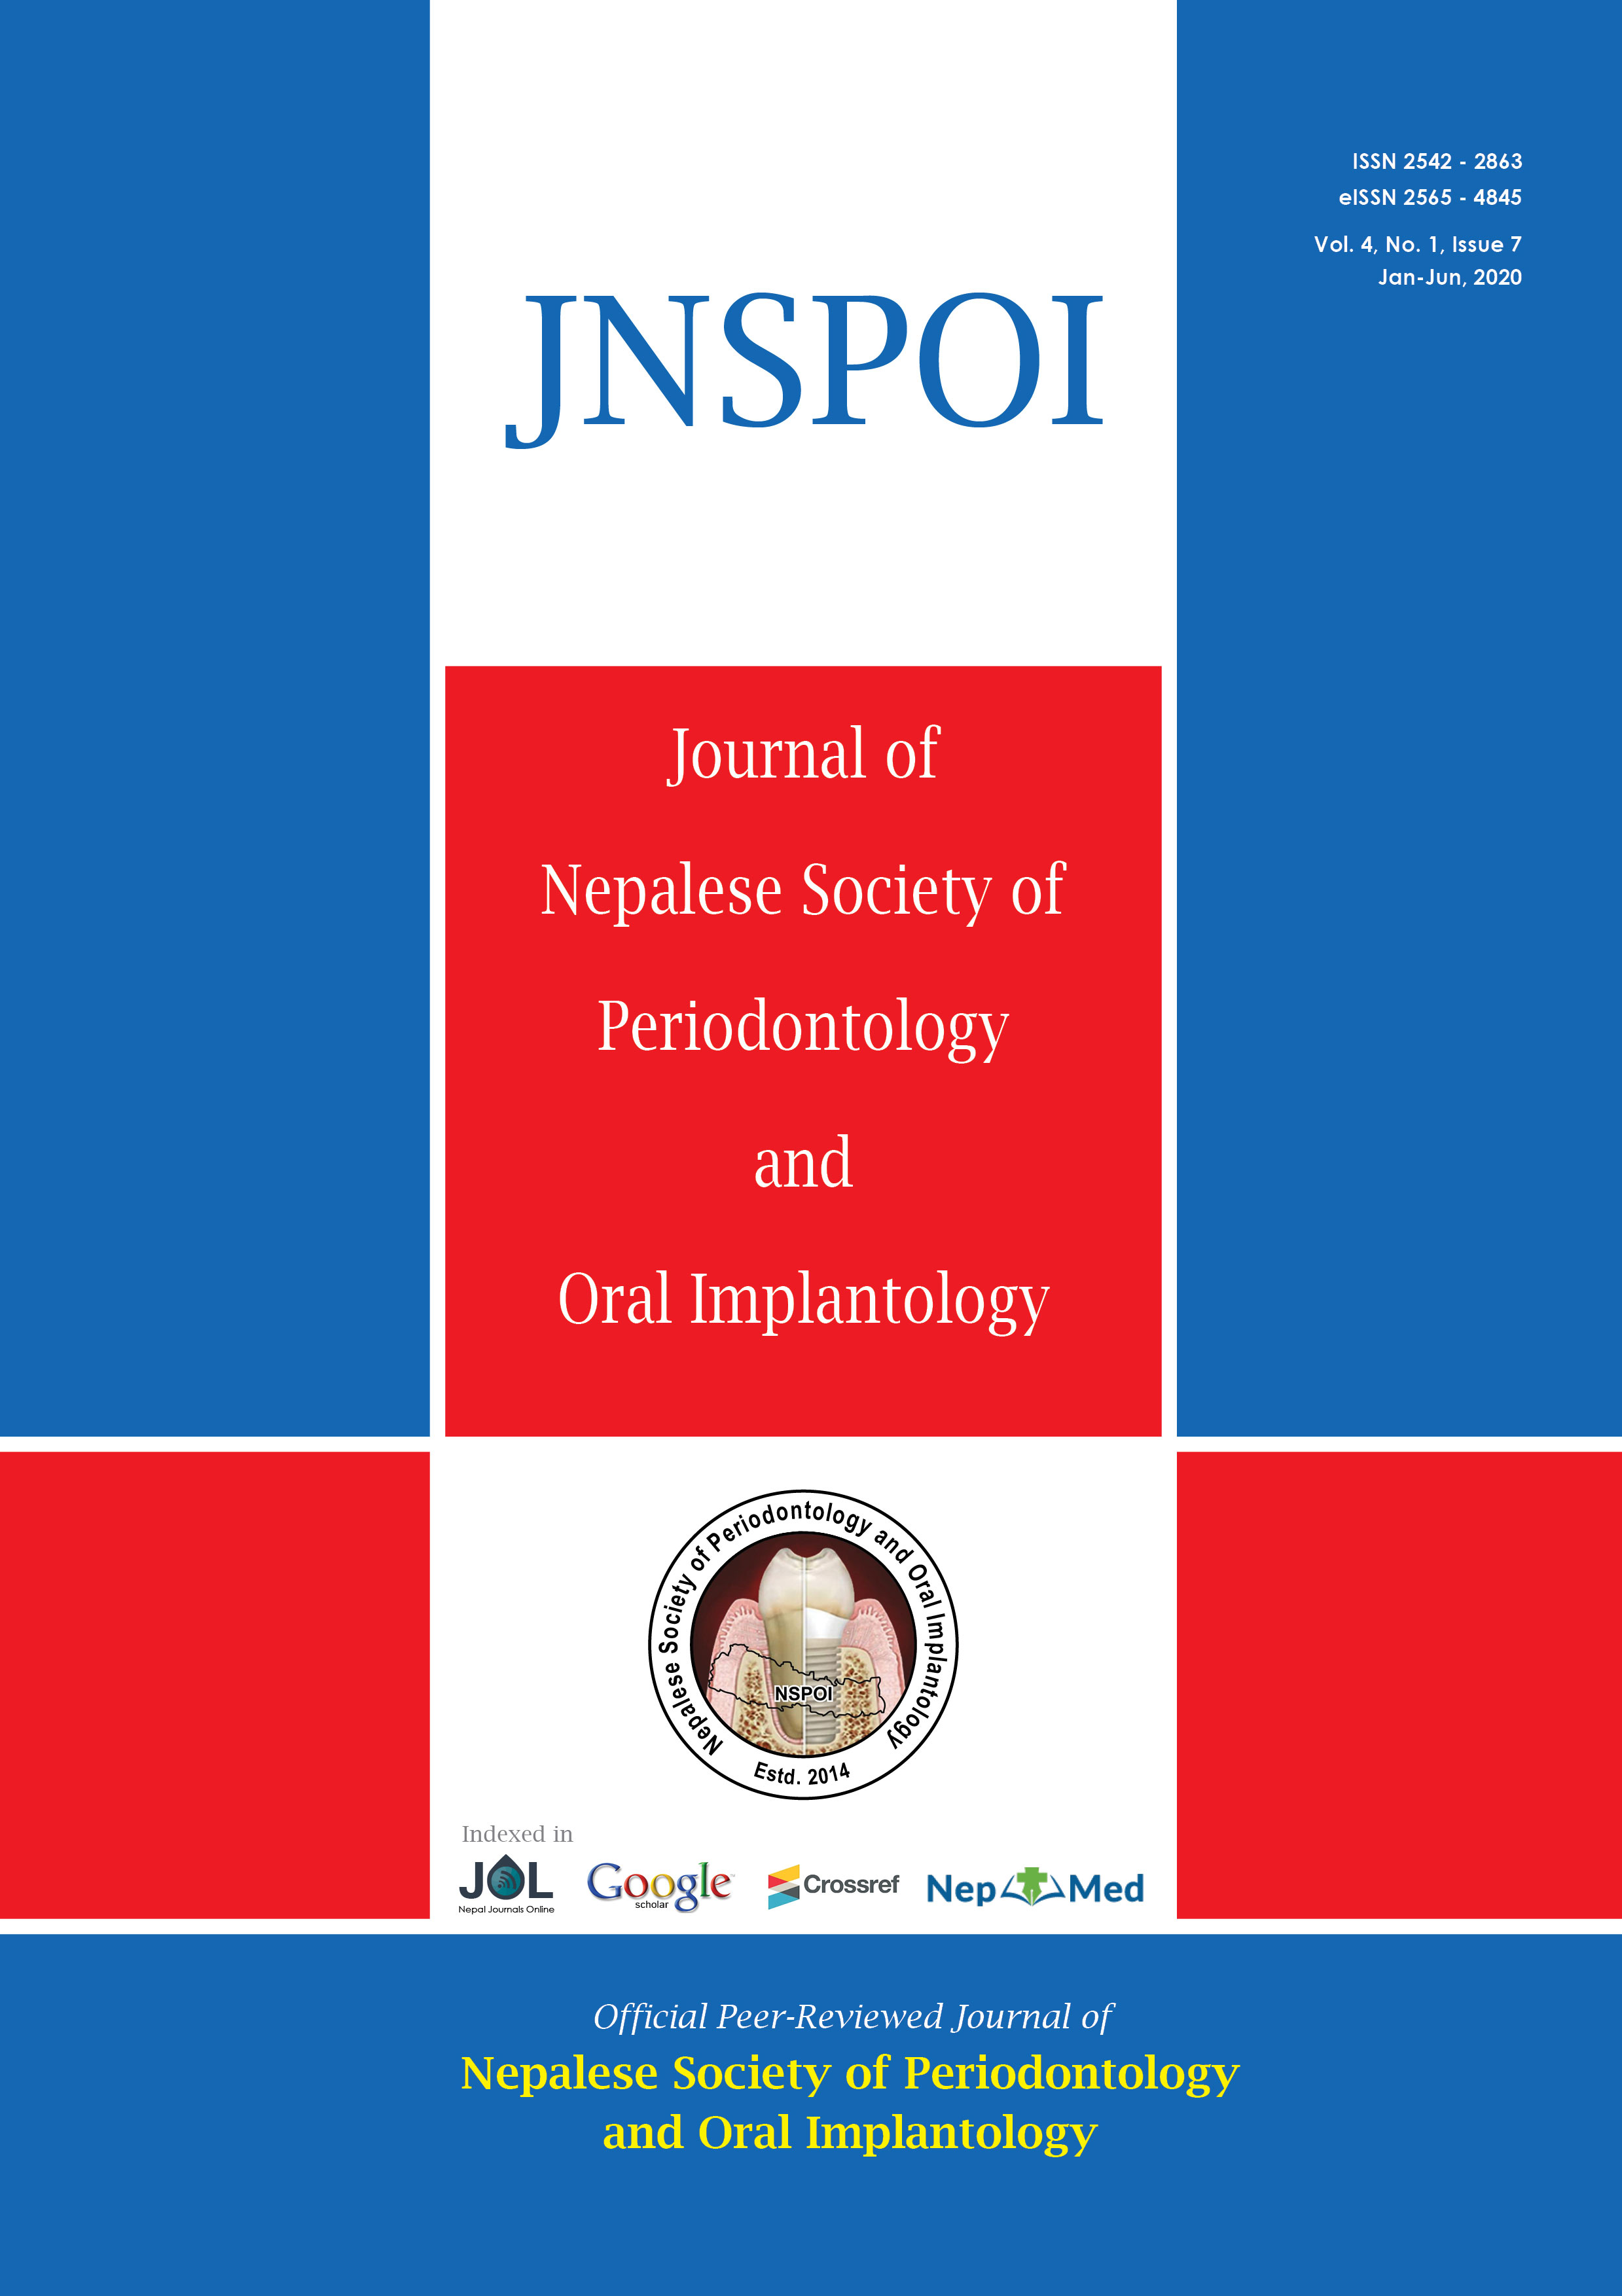 JNSPOI - Vol 4 - No 1 - Issue 7